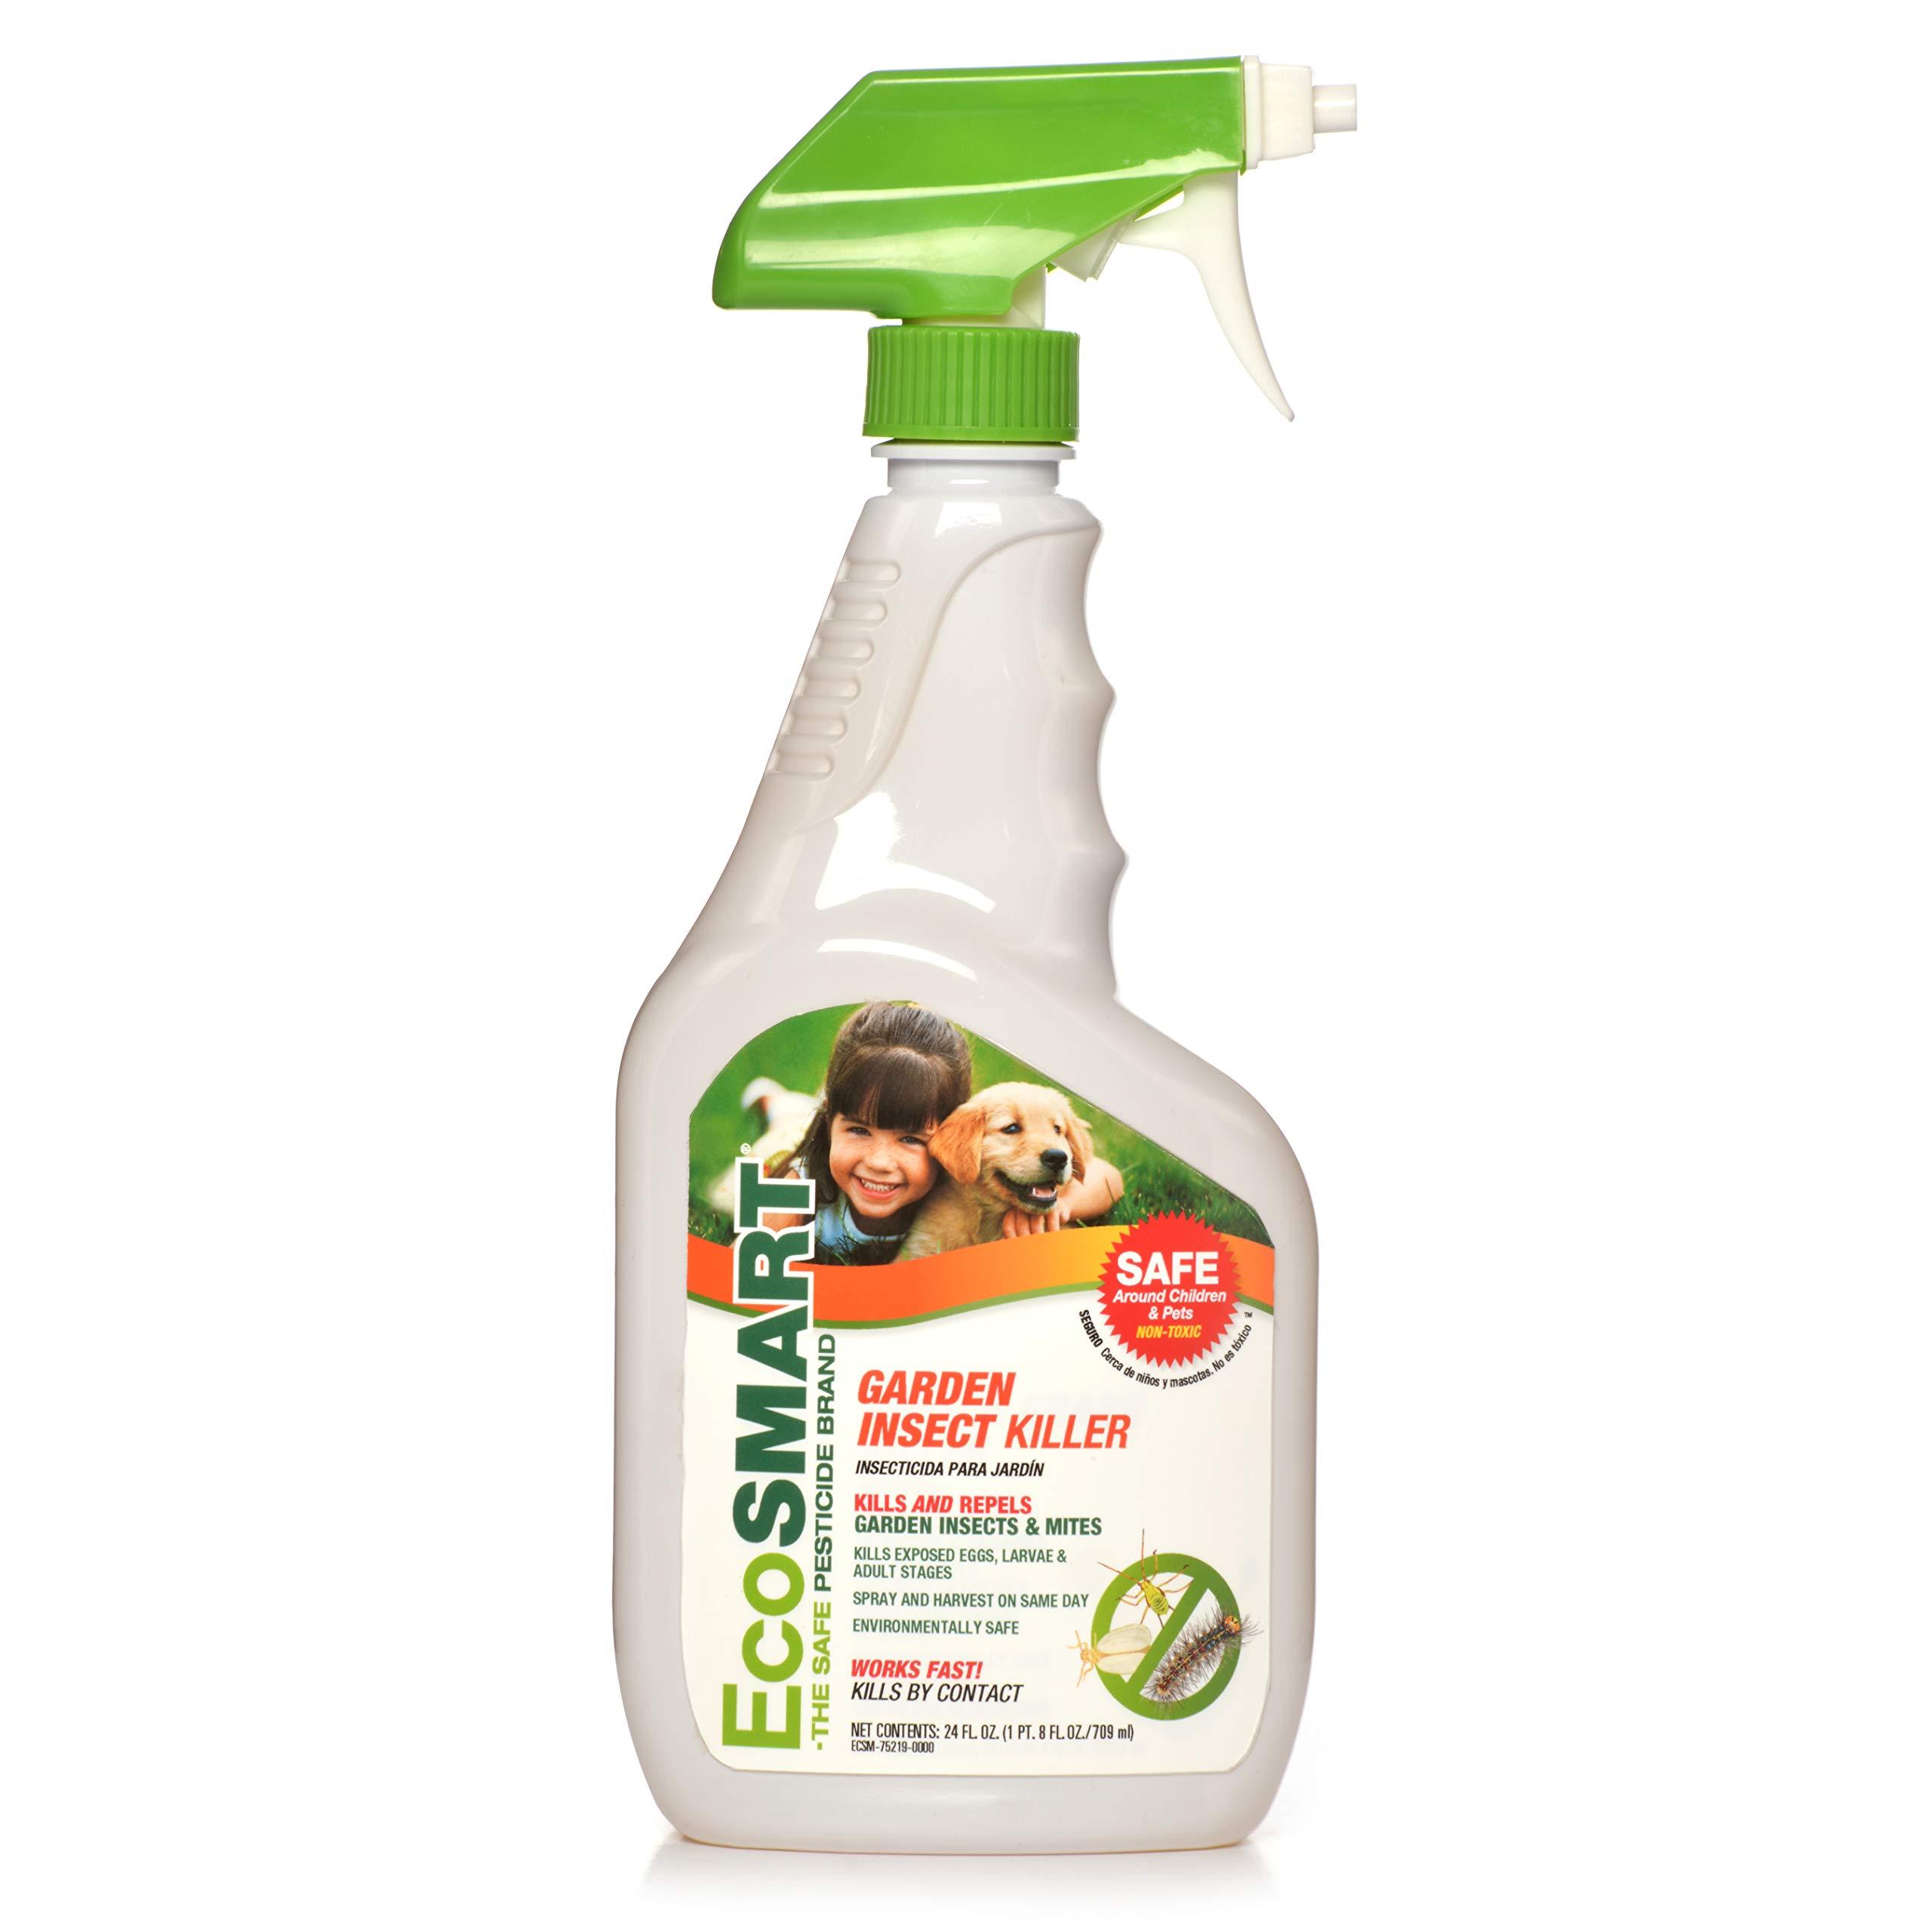 EcoSMART Garden Insect Killer, 24 oz. Ready-to-Spray Bottle by Ecosmart